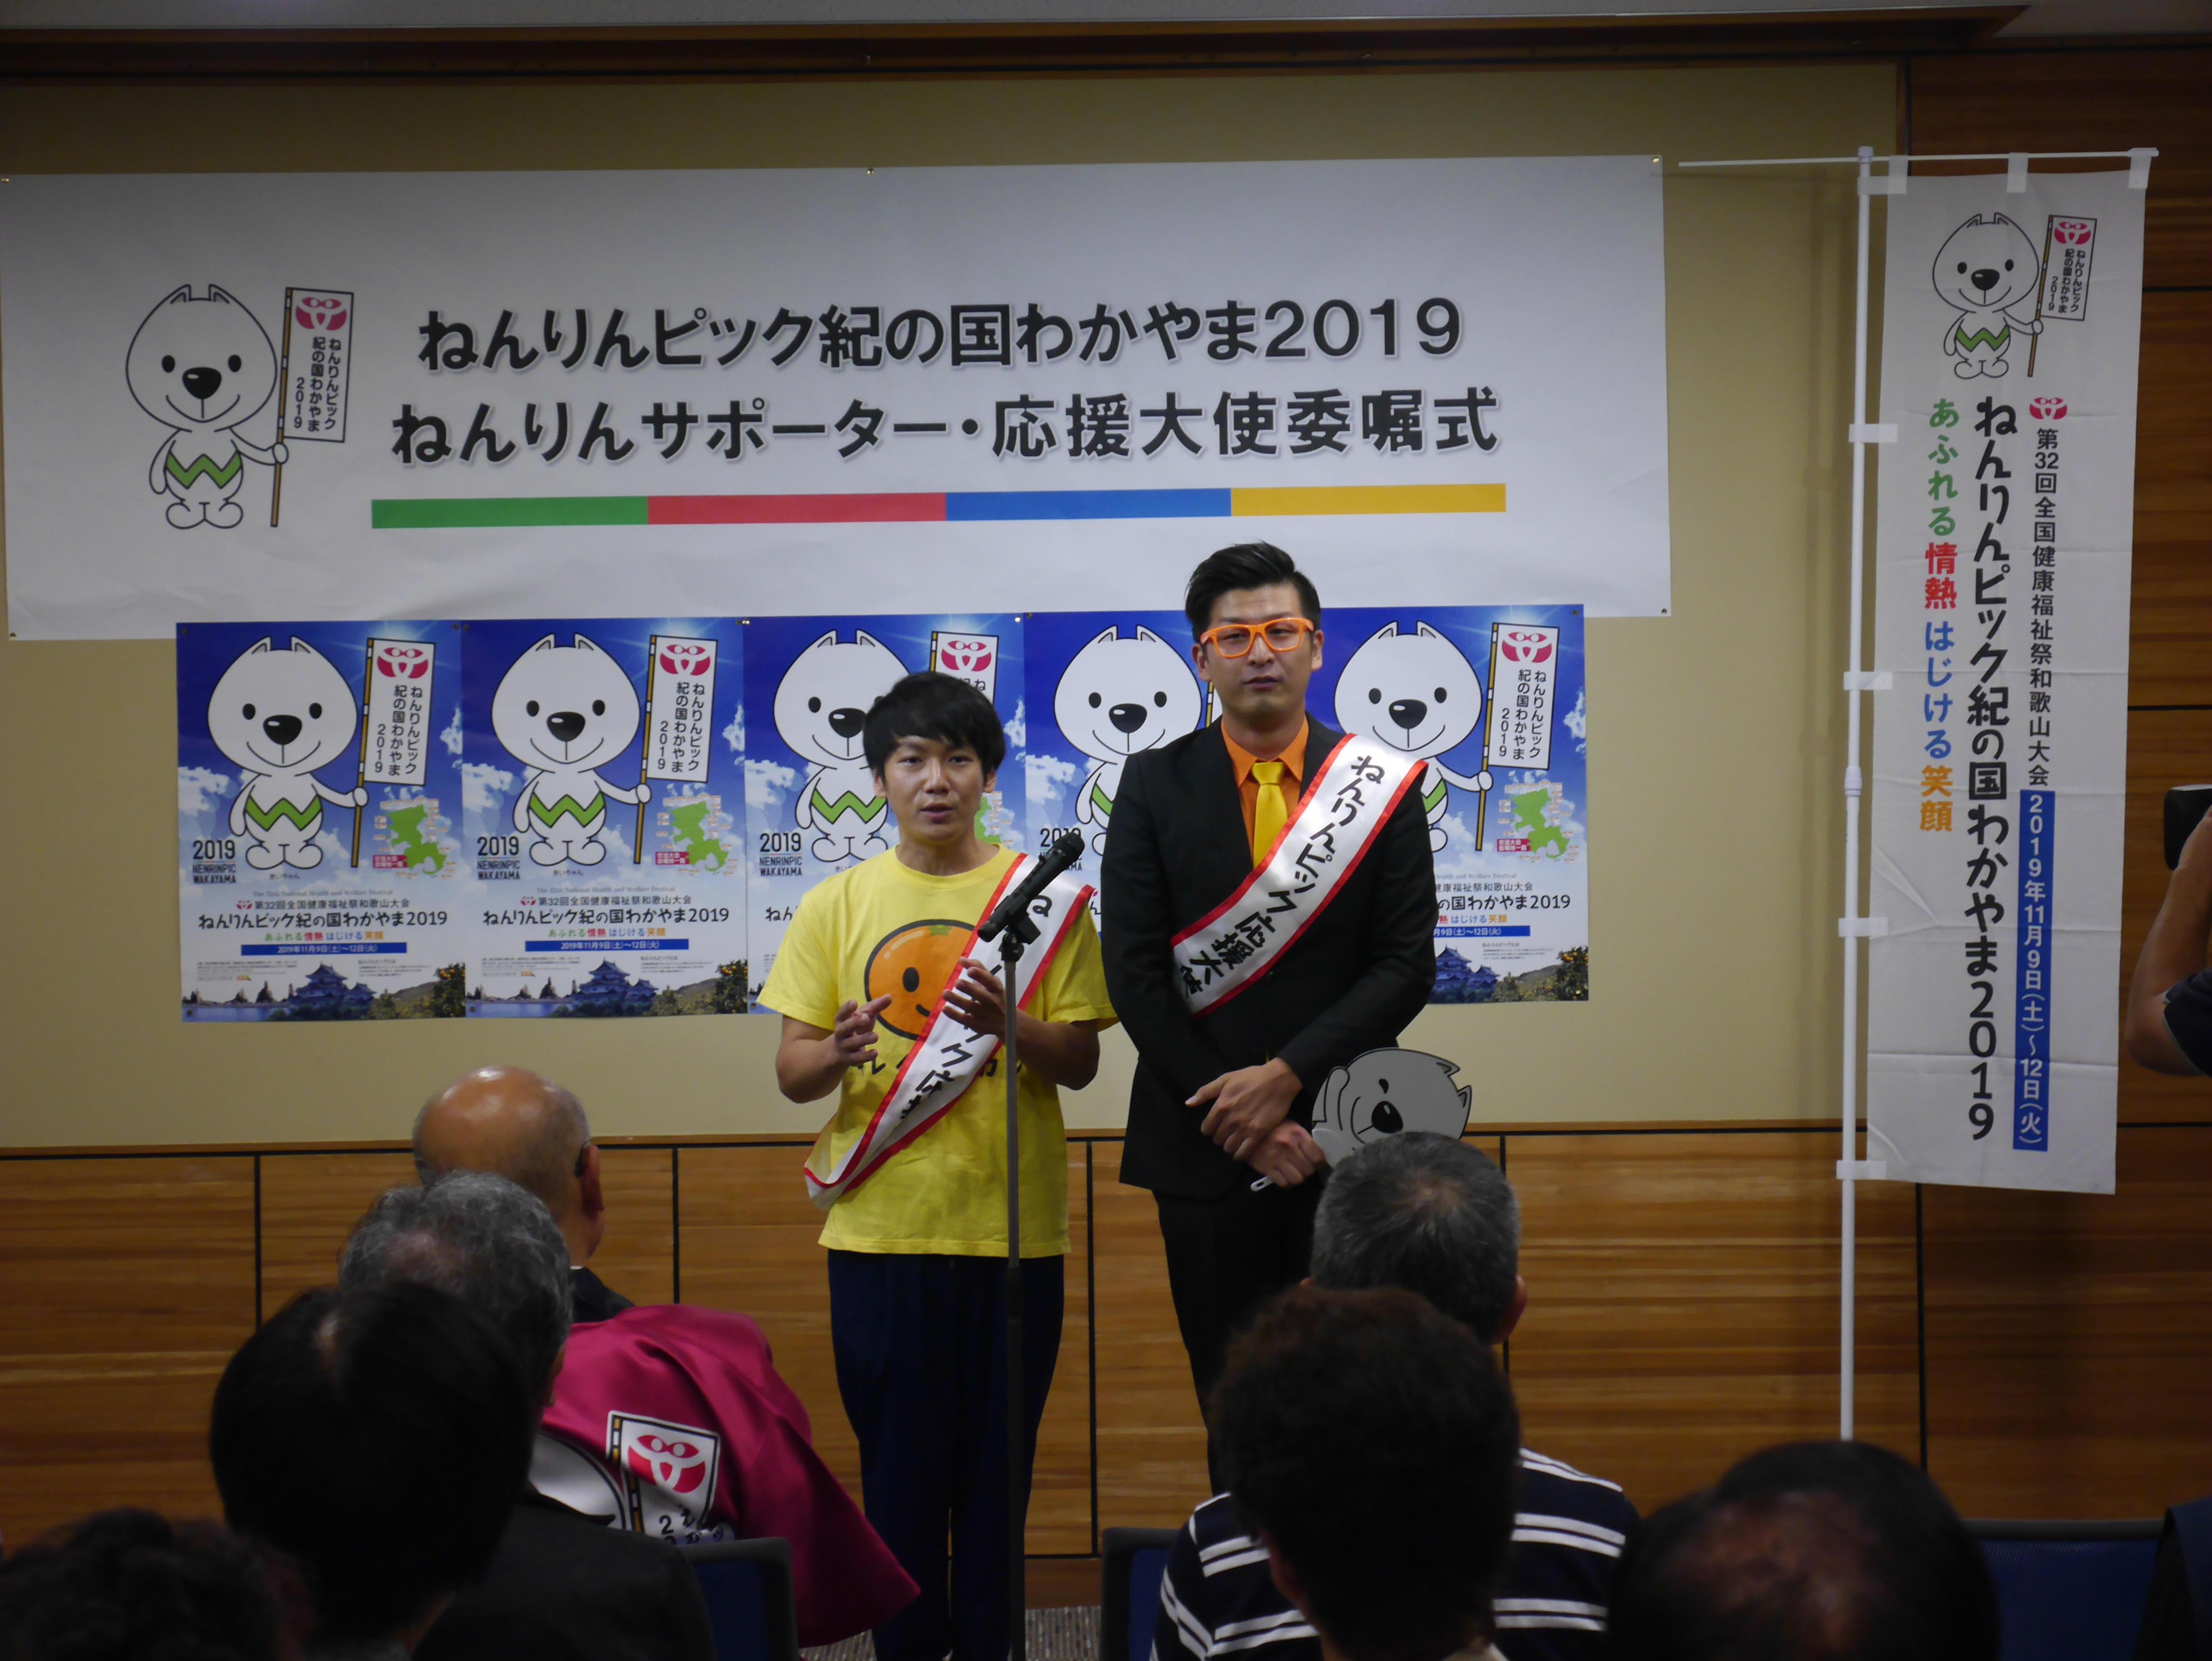 http://news.yoshimoto.co.jp/20181005203121-7bad914c9ee31ba89500d841348014e99ed1a973.jpg